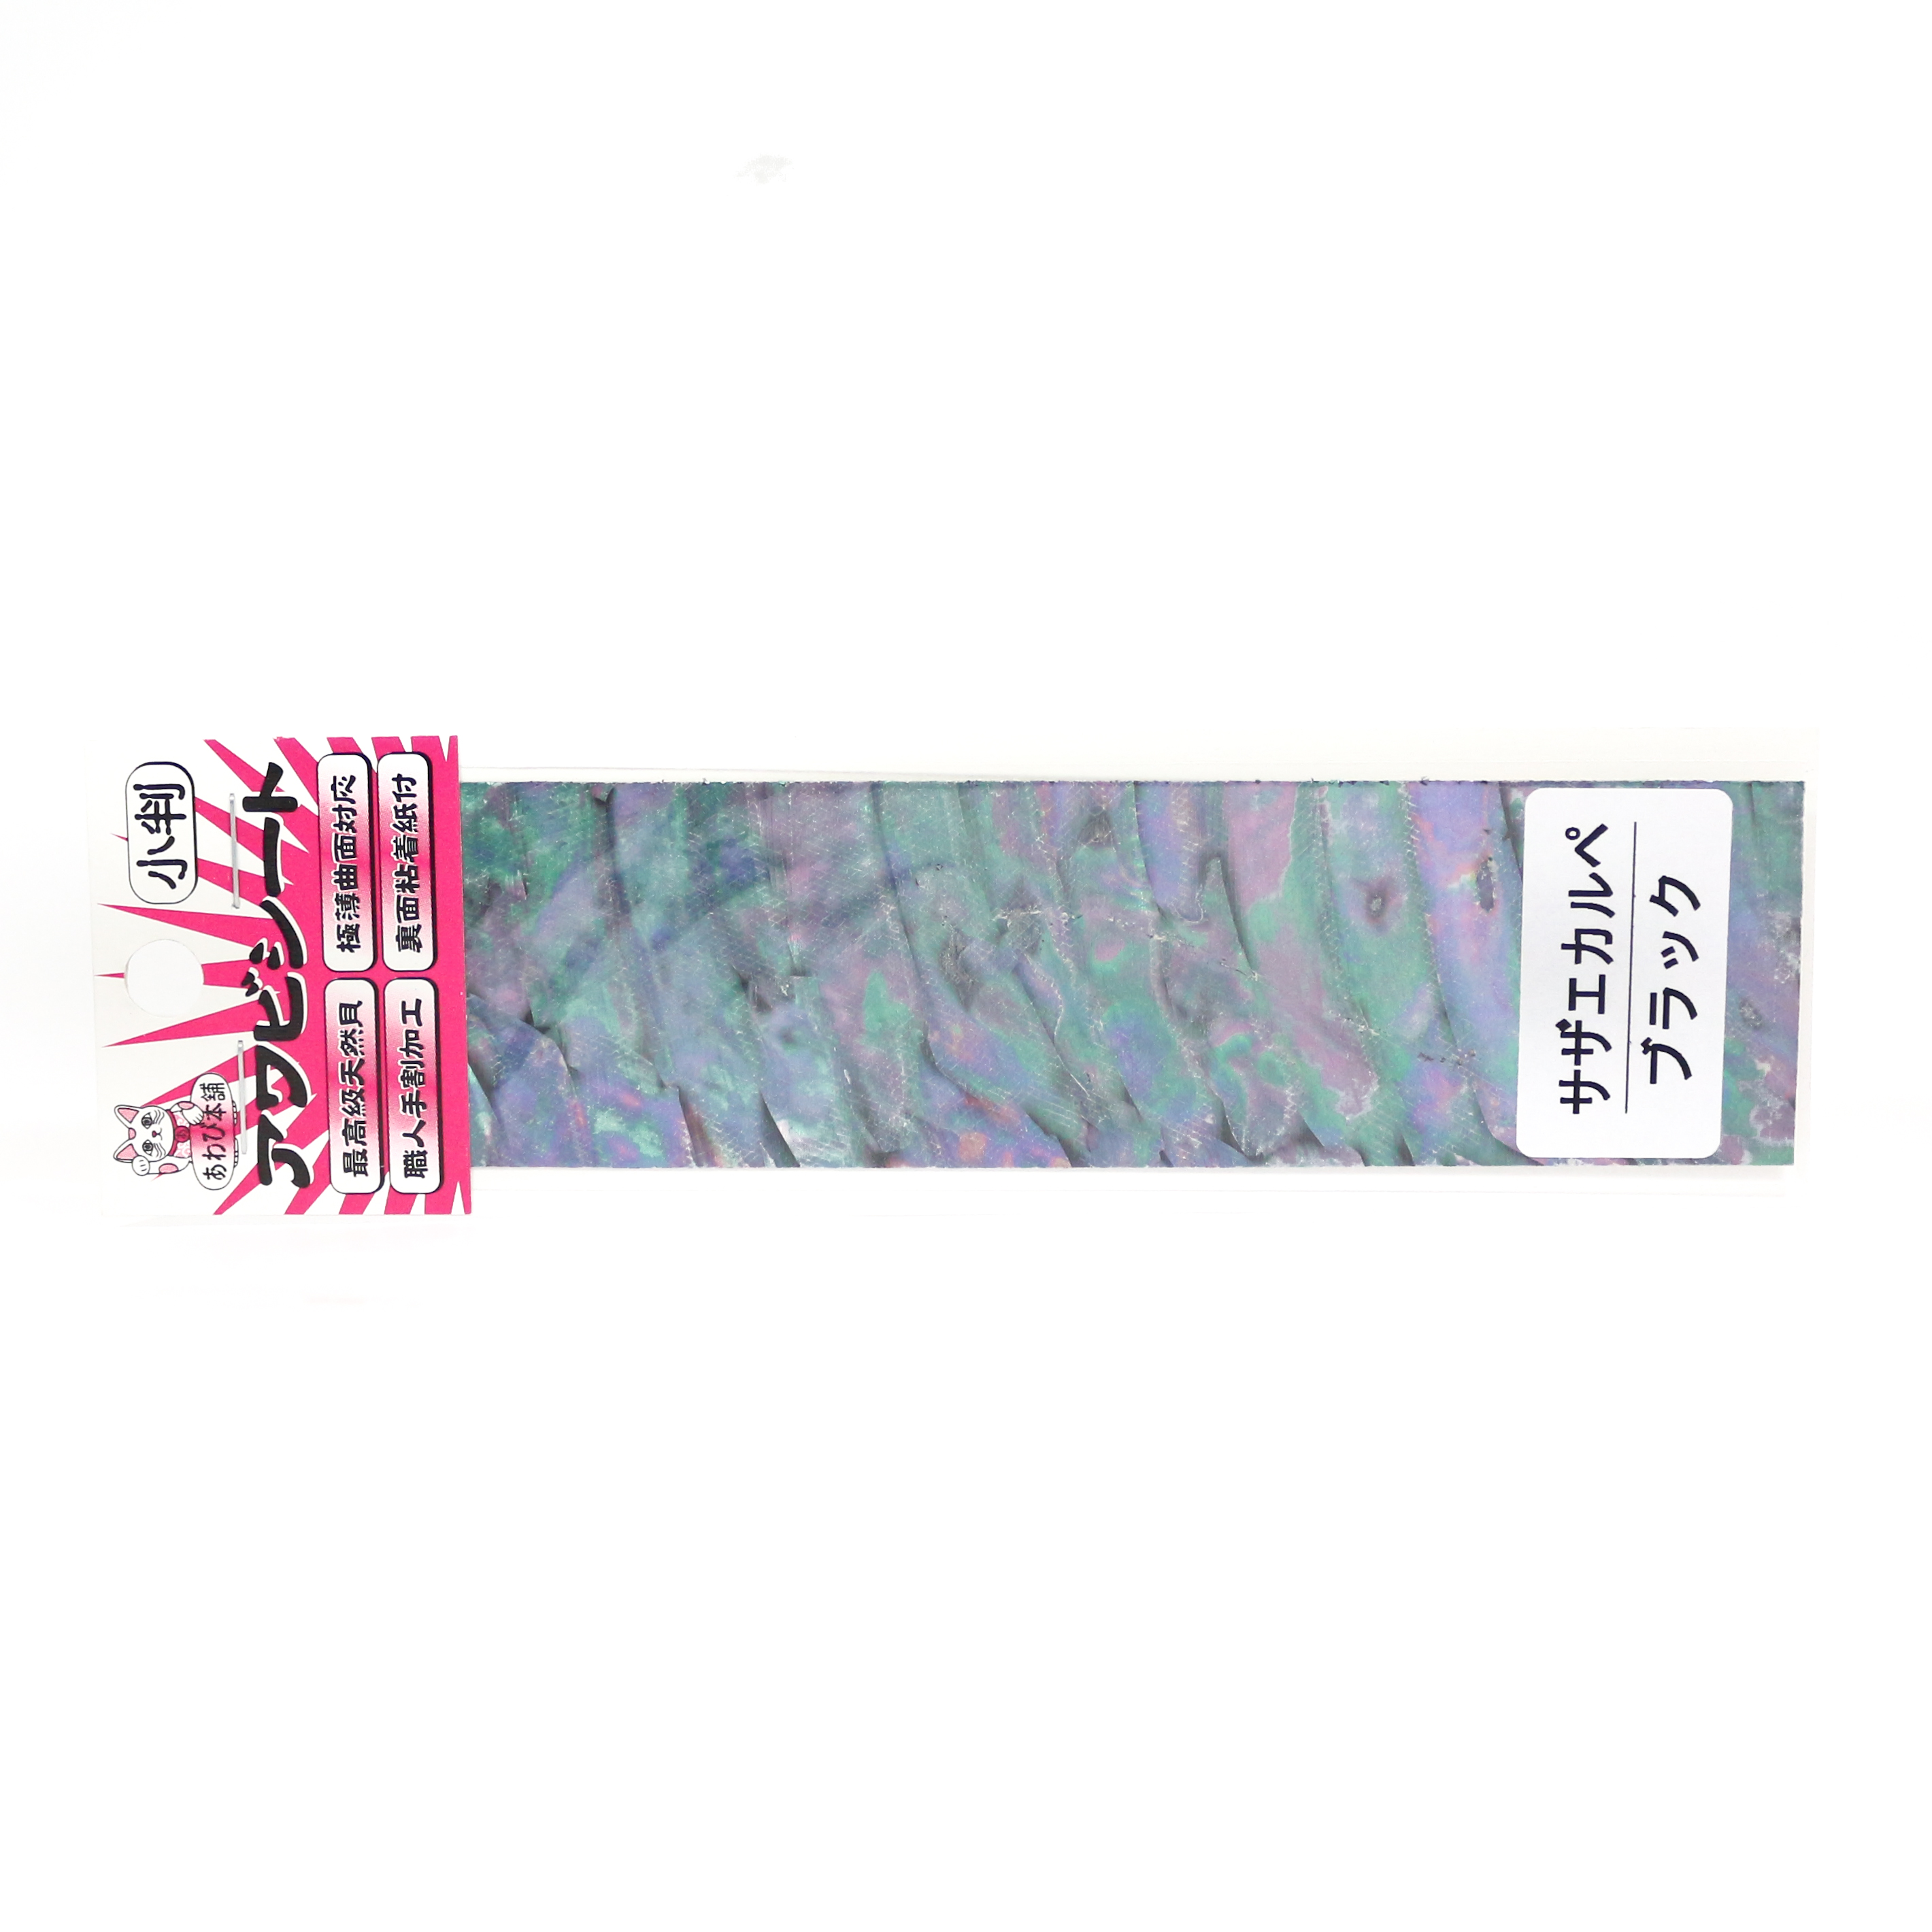 Awabi Honpo Awabi Sheet Sazae Karupe Size S 40 x 140 mm Black (3386)